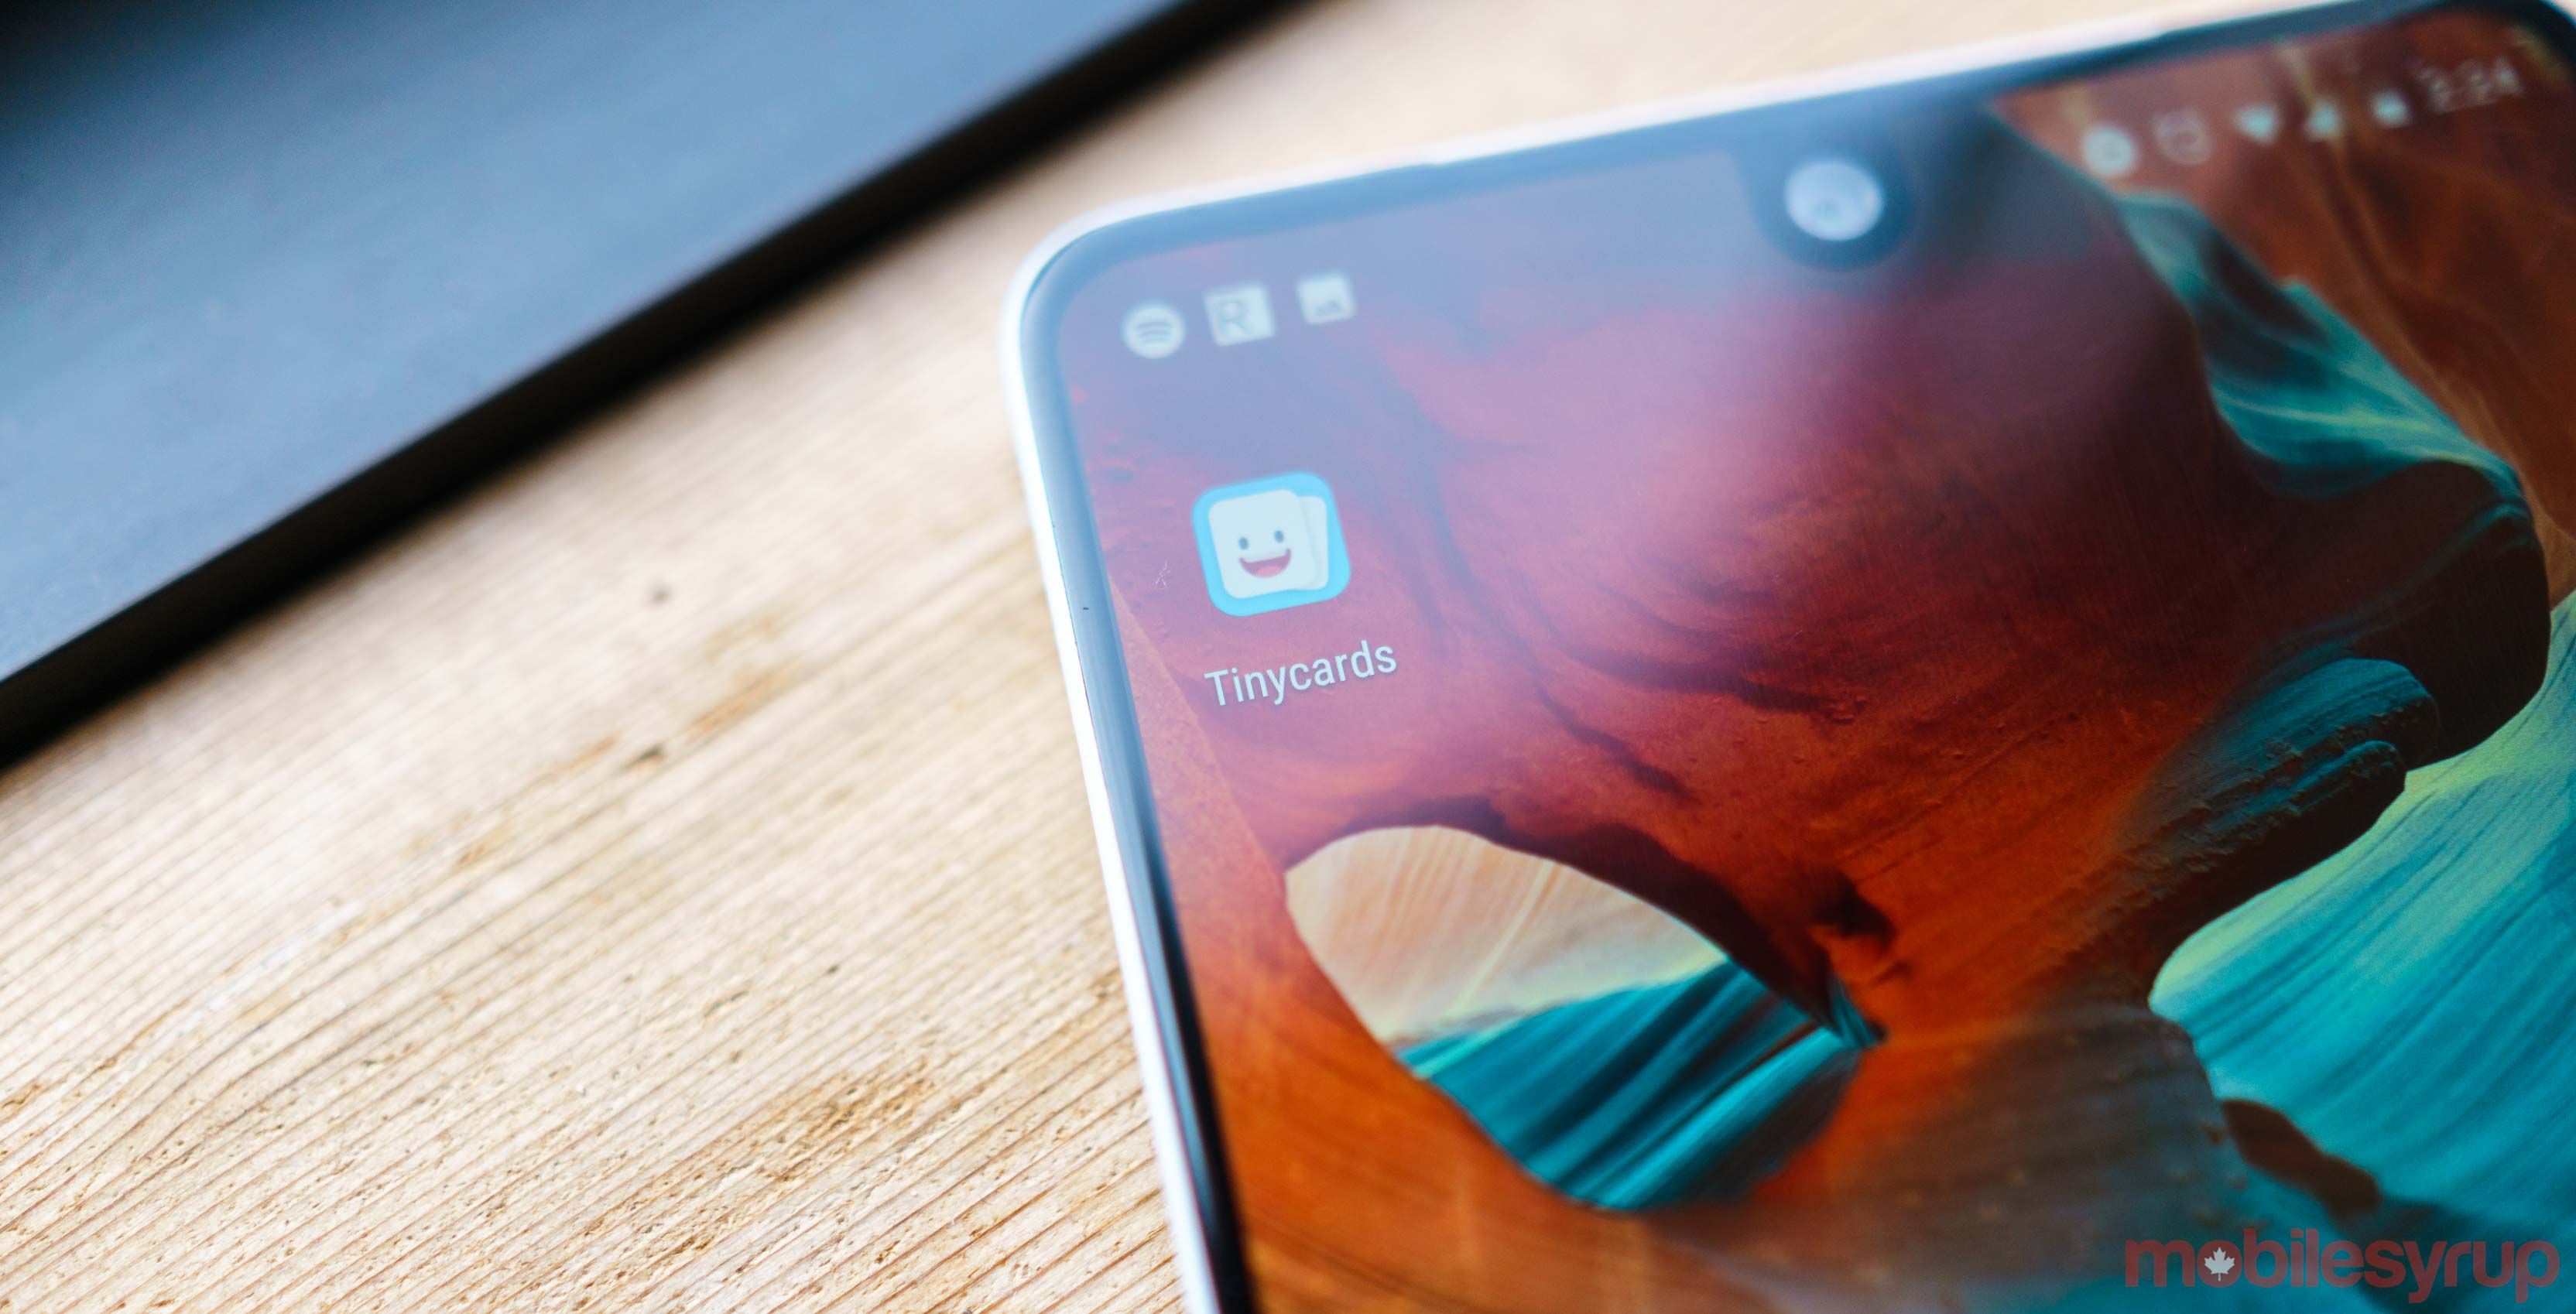 Tinycards, a flashcard app by Duolingo